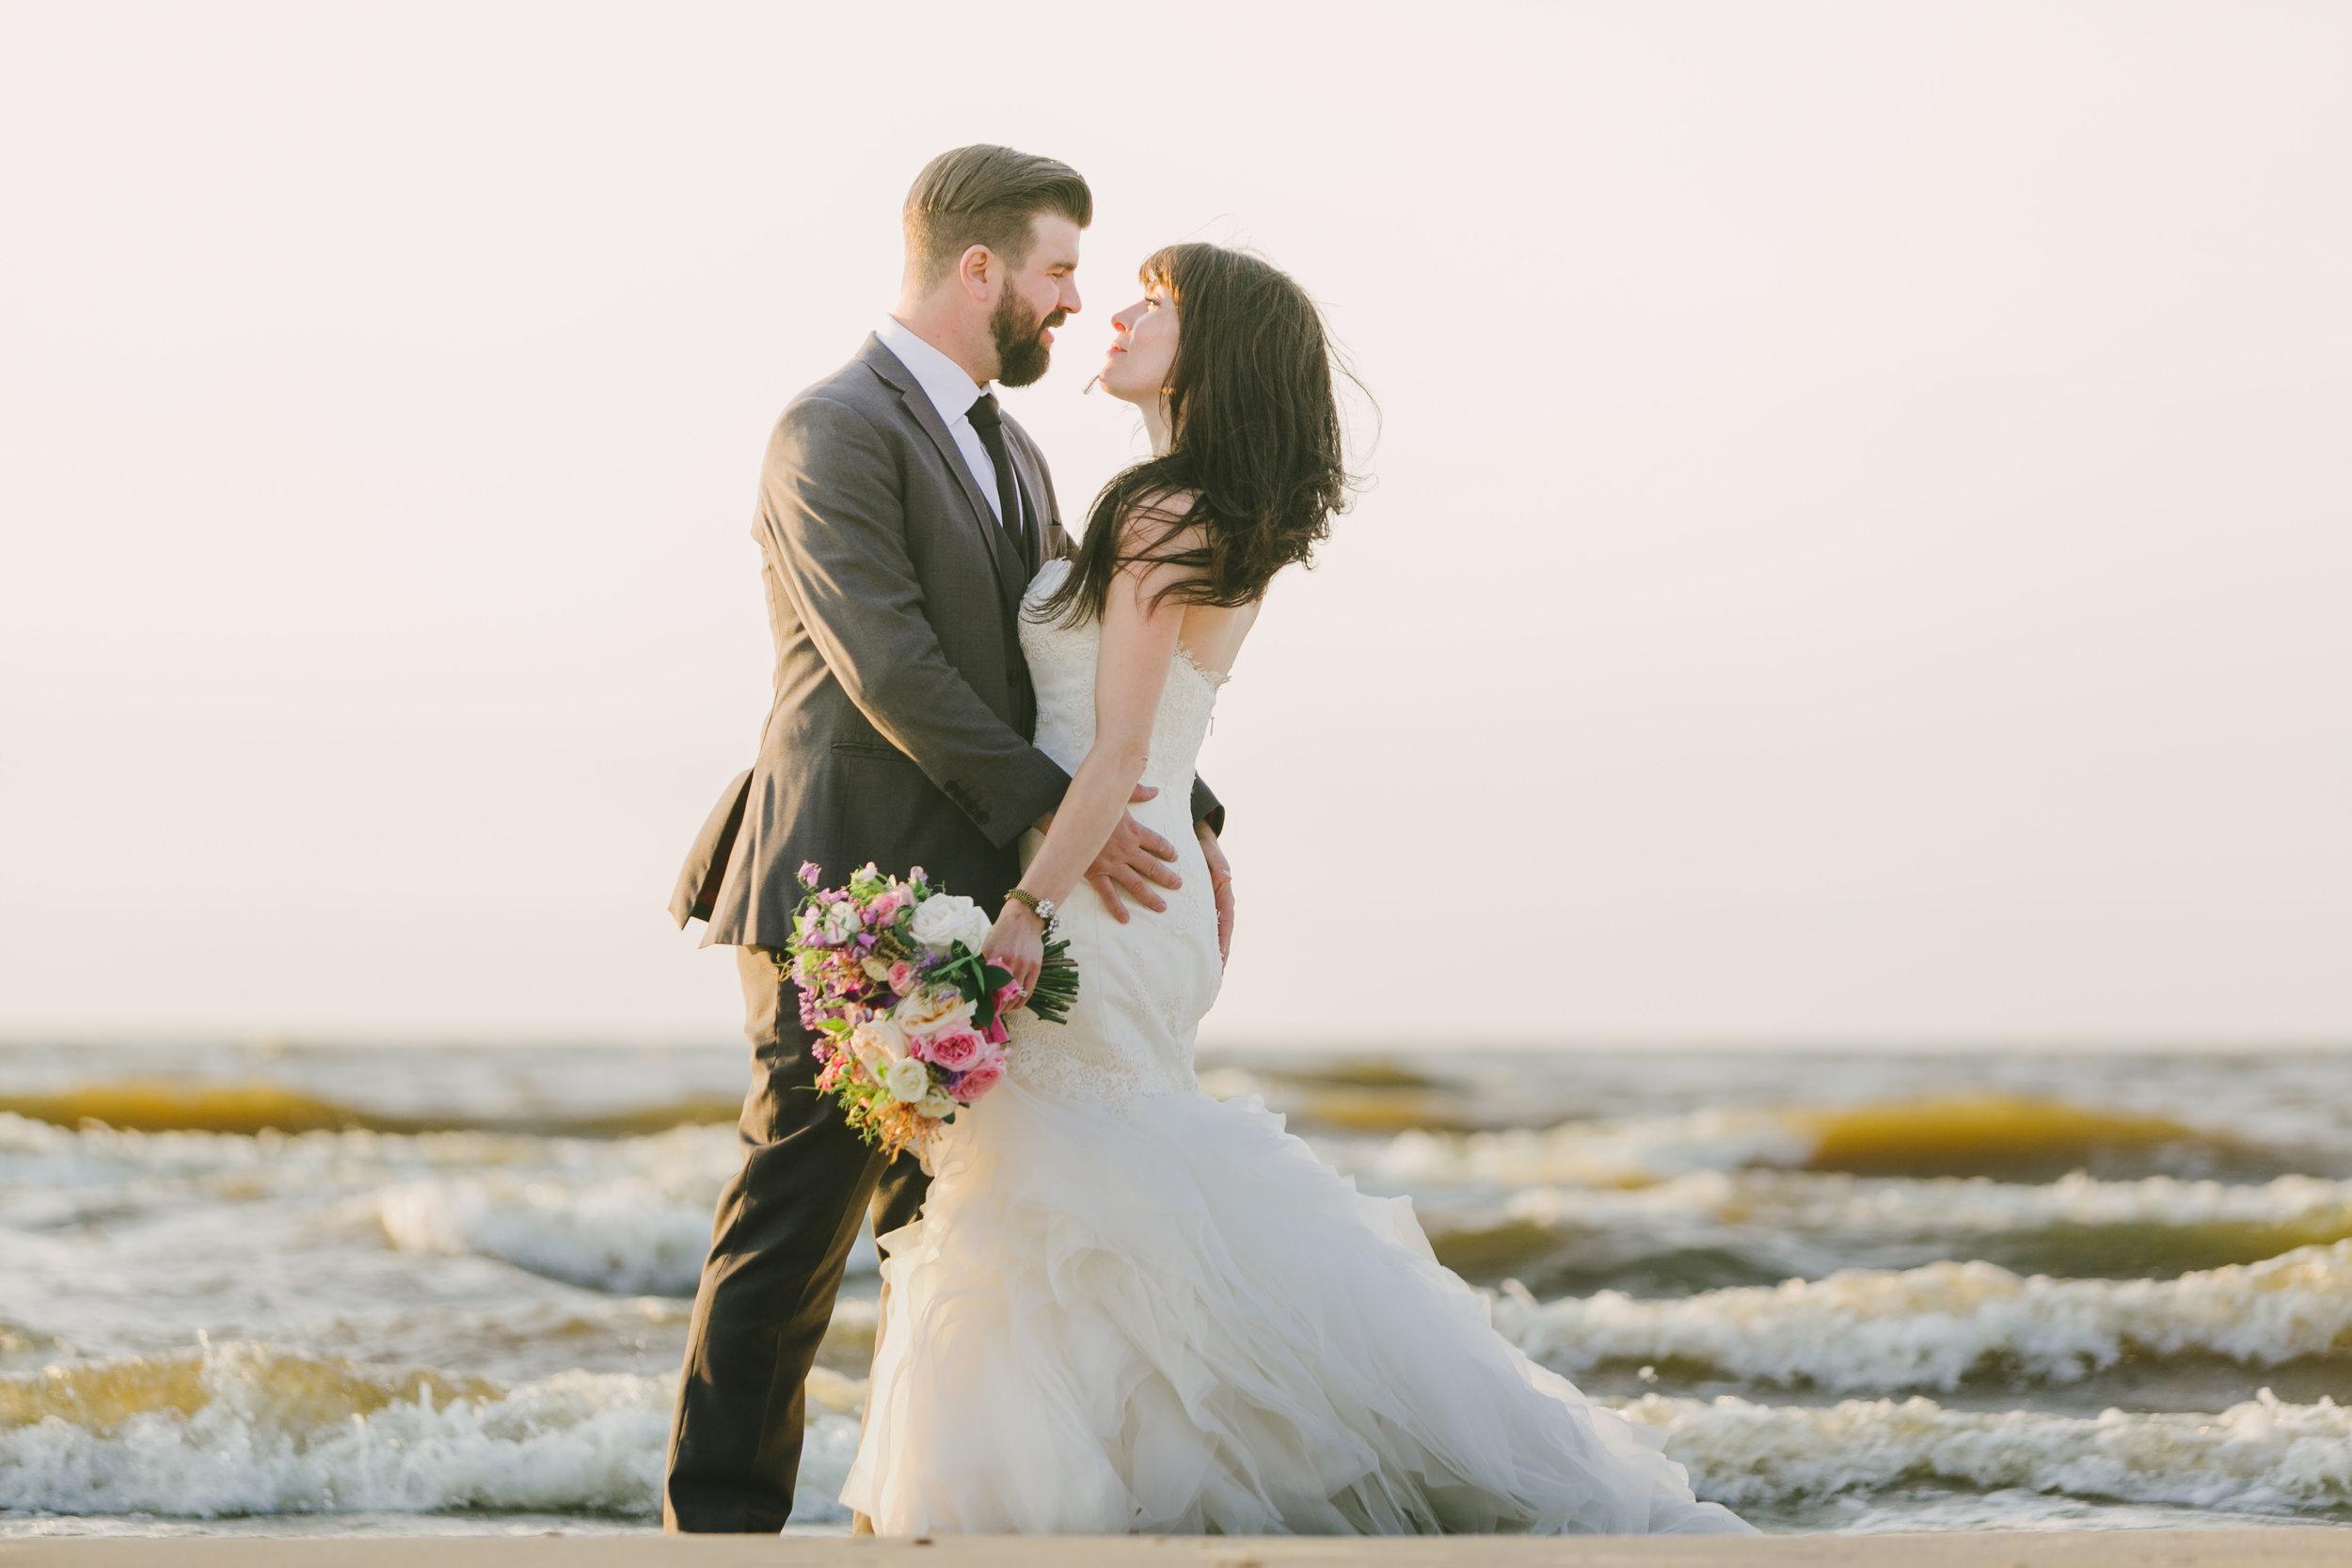 Beach Wedding Photos - Winnipeg Weddings